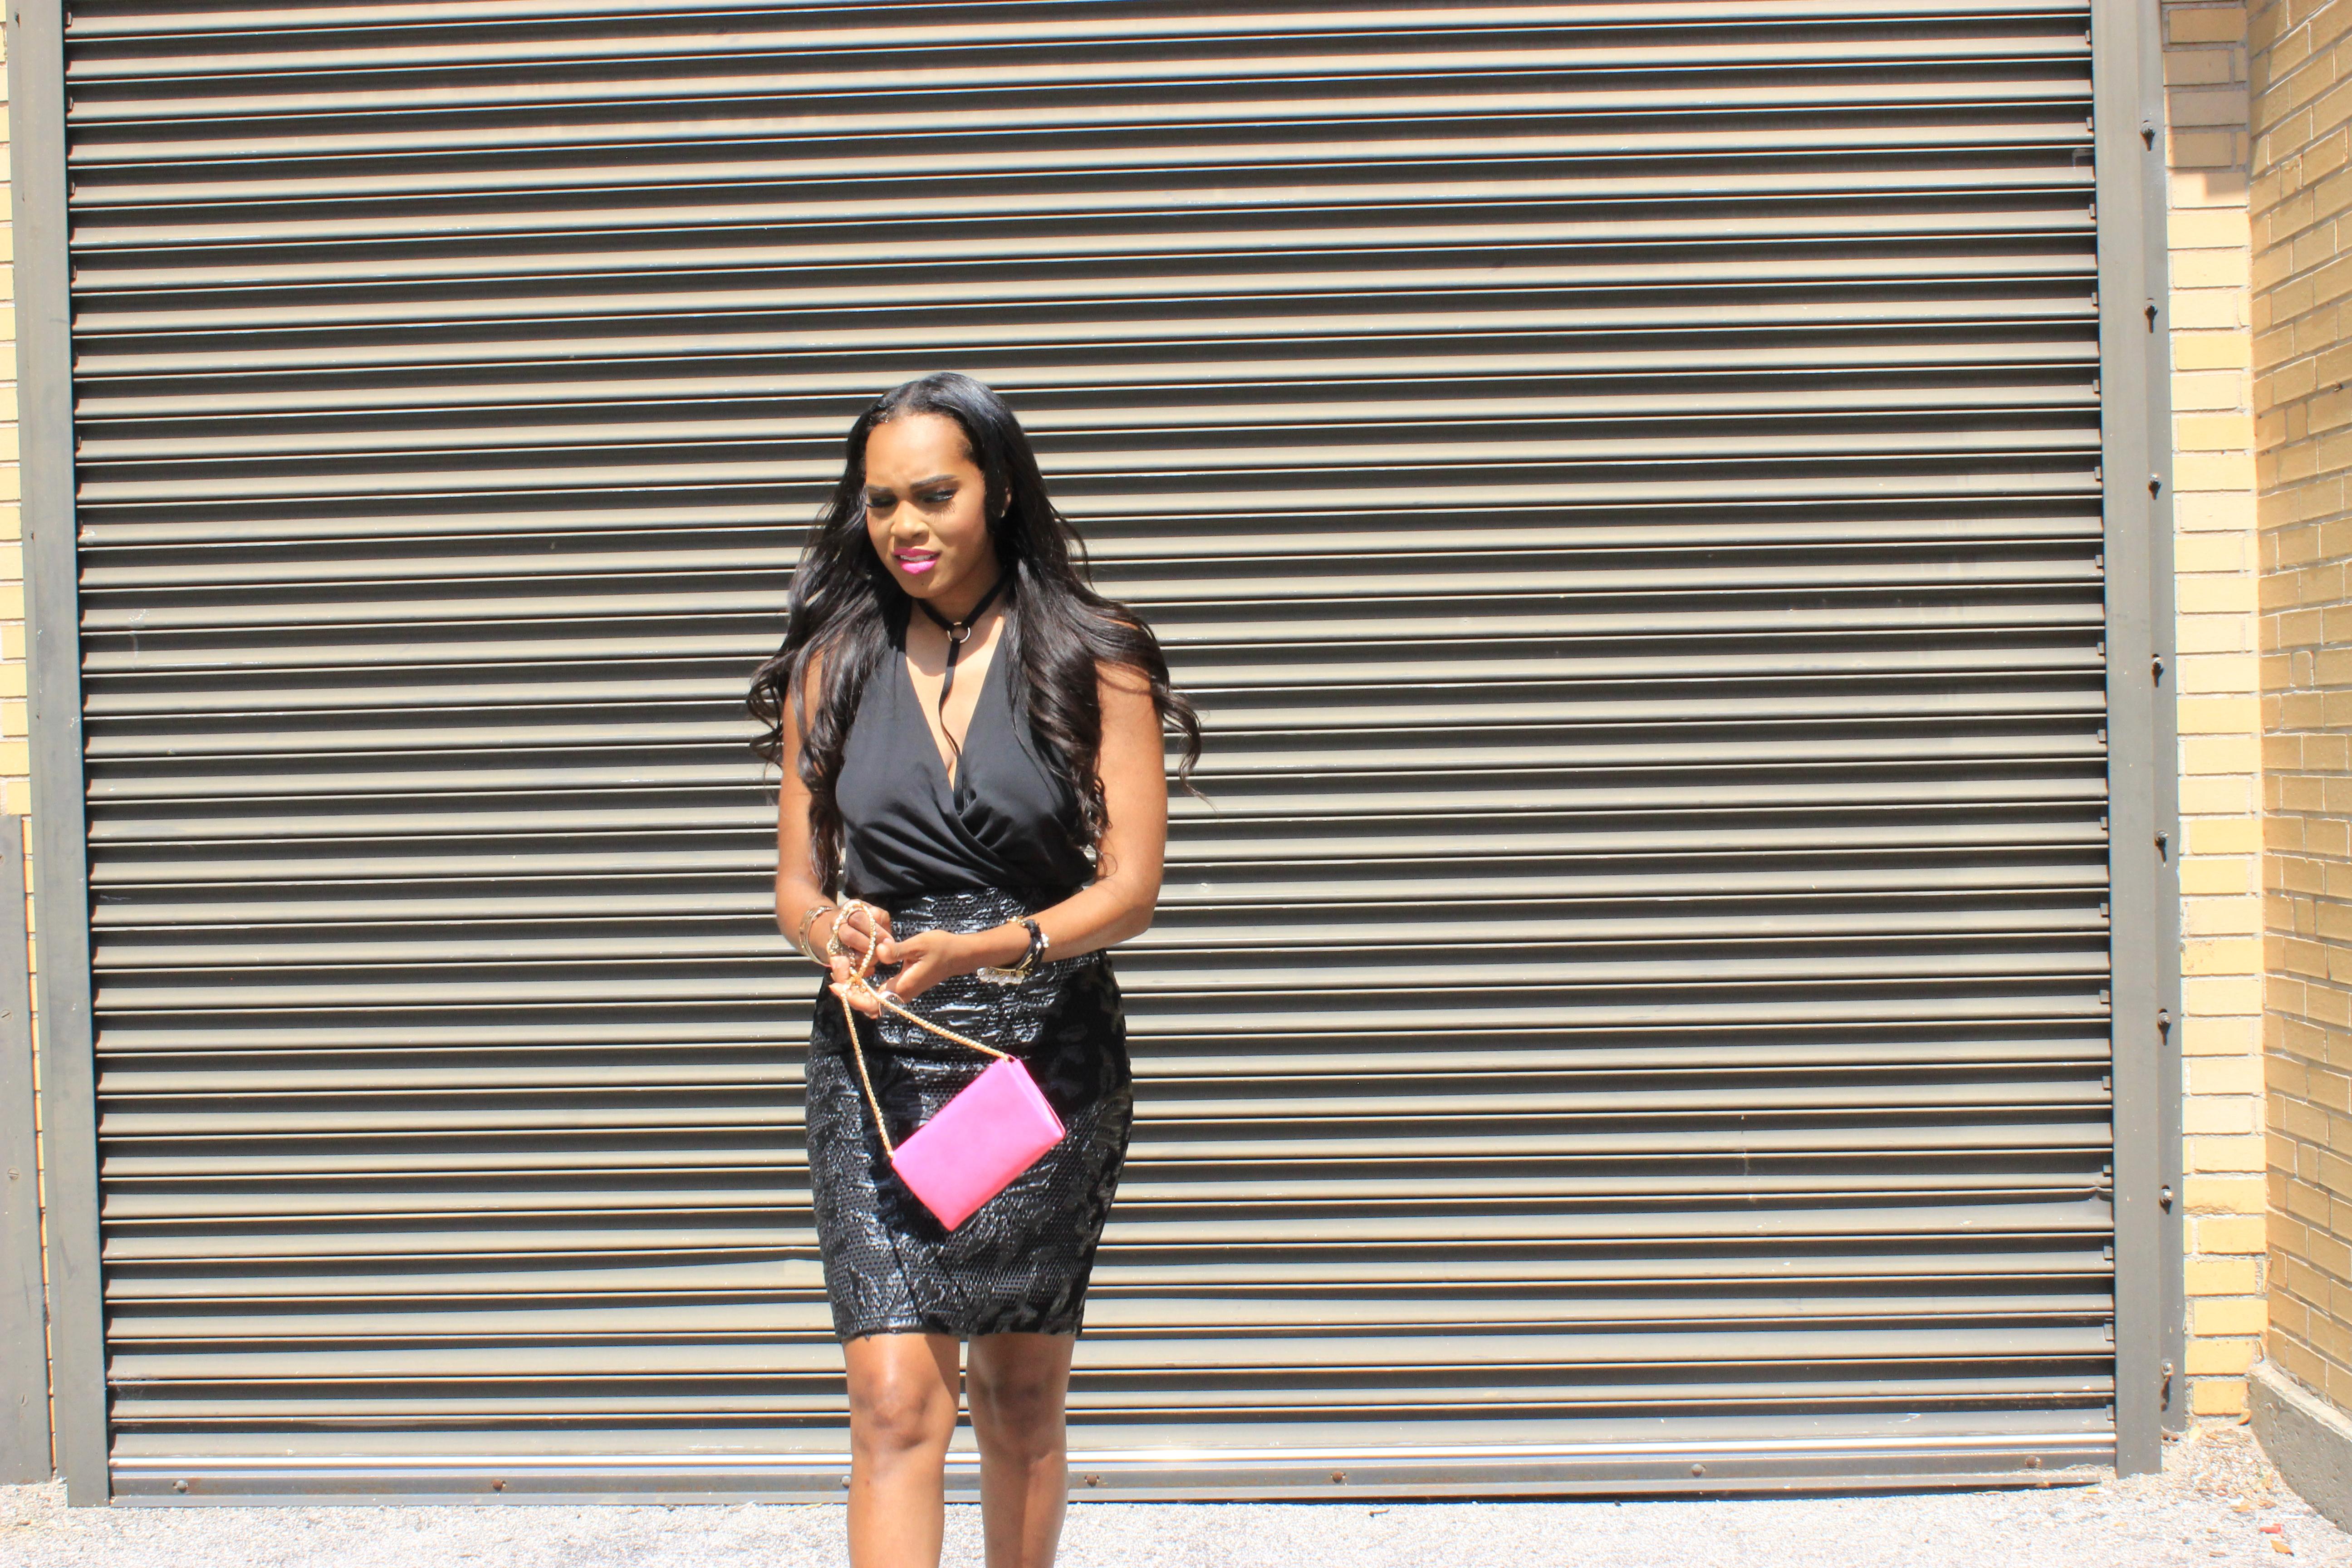 Style-Files-Forever-21-black-lace-pencil-skirt-victoria-secret-black-vneck-bodysuit-all-black-fashion-look-Zara-vinyl-d-orsay-pumps-oohlalablog-7